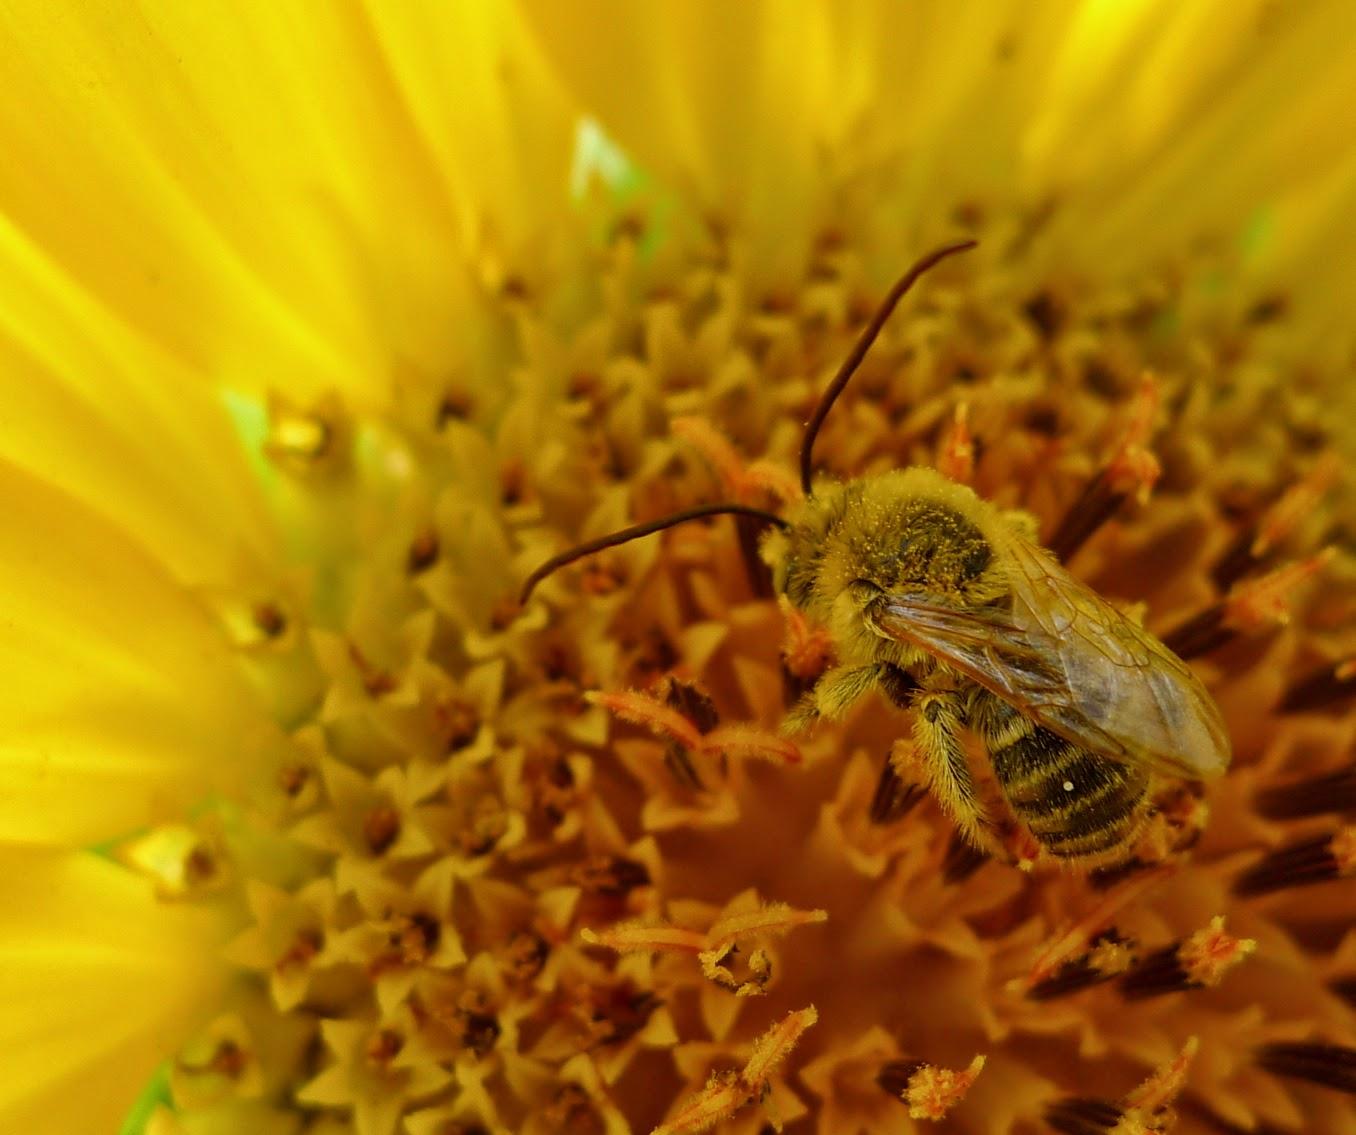 Long-horned Bee on Sunseed Sunflower, gardening, pollinators, urban farming